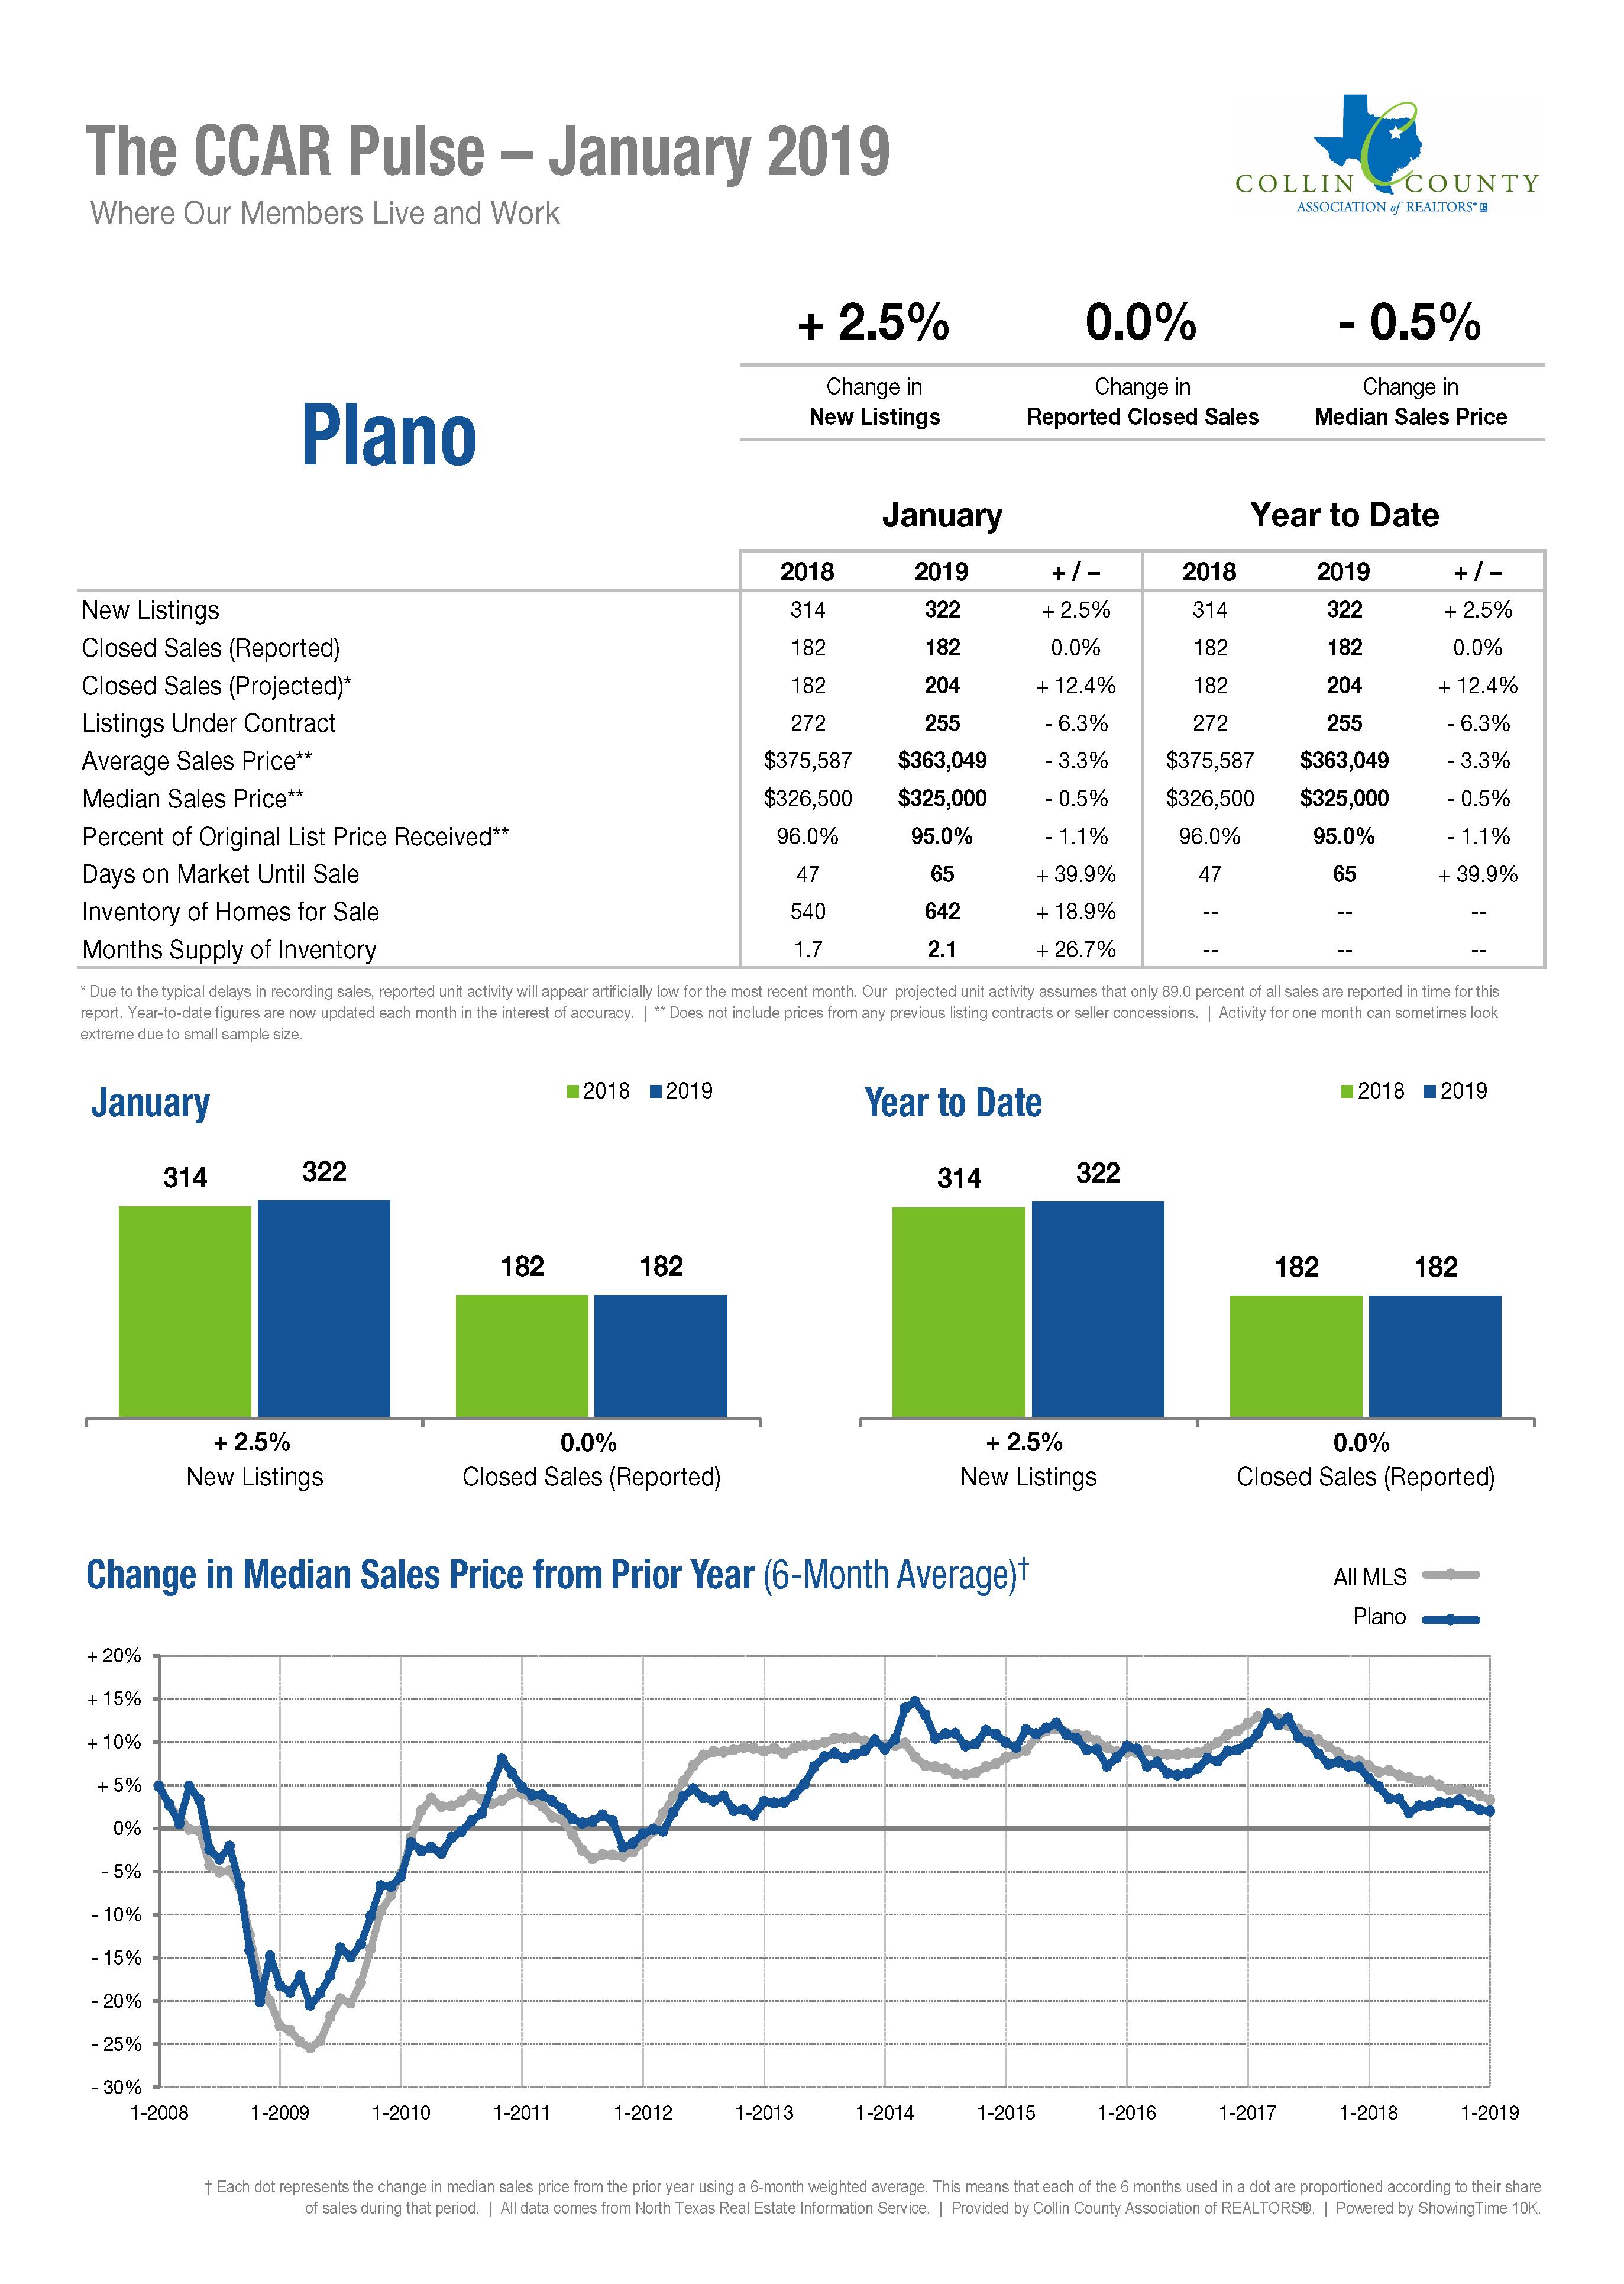 Plano Real Estate Market Statistics - January 2019